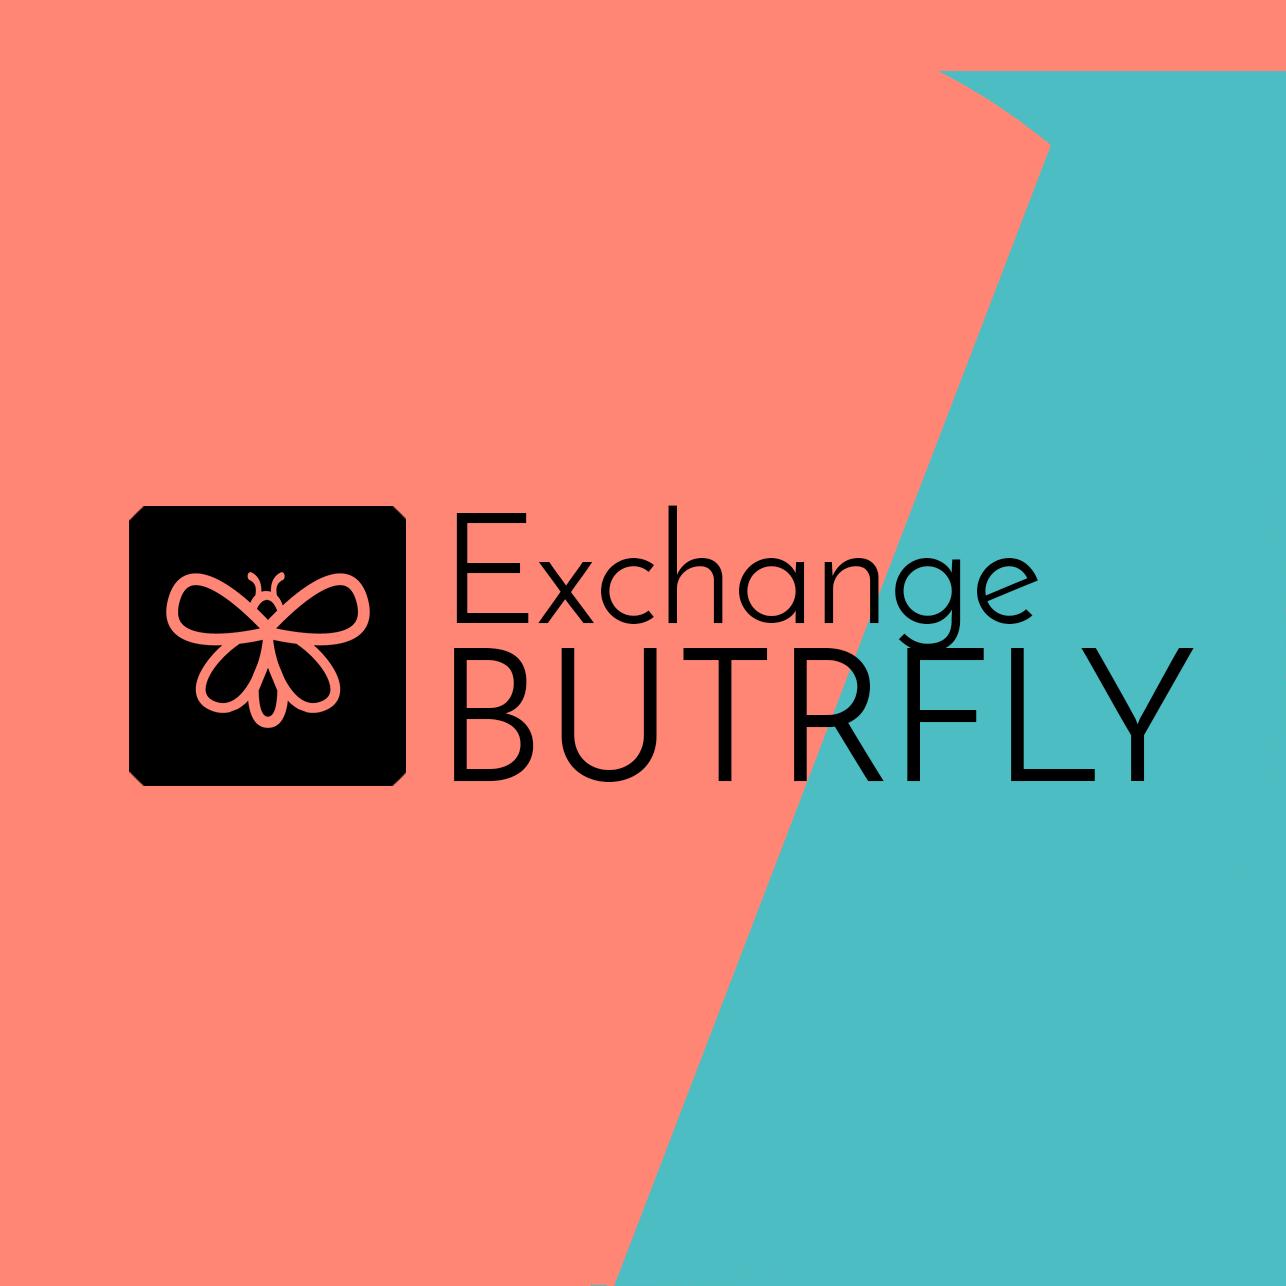 Exchange Butrfly